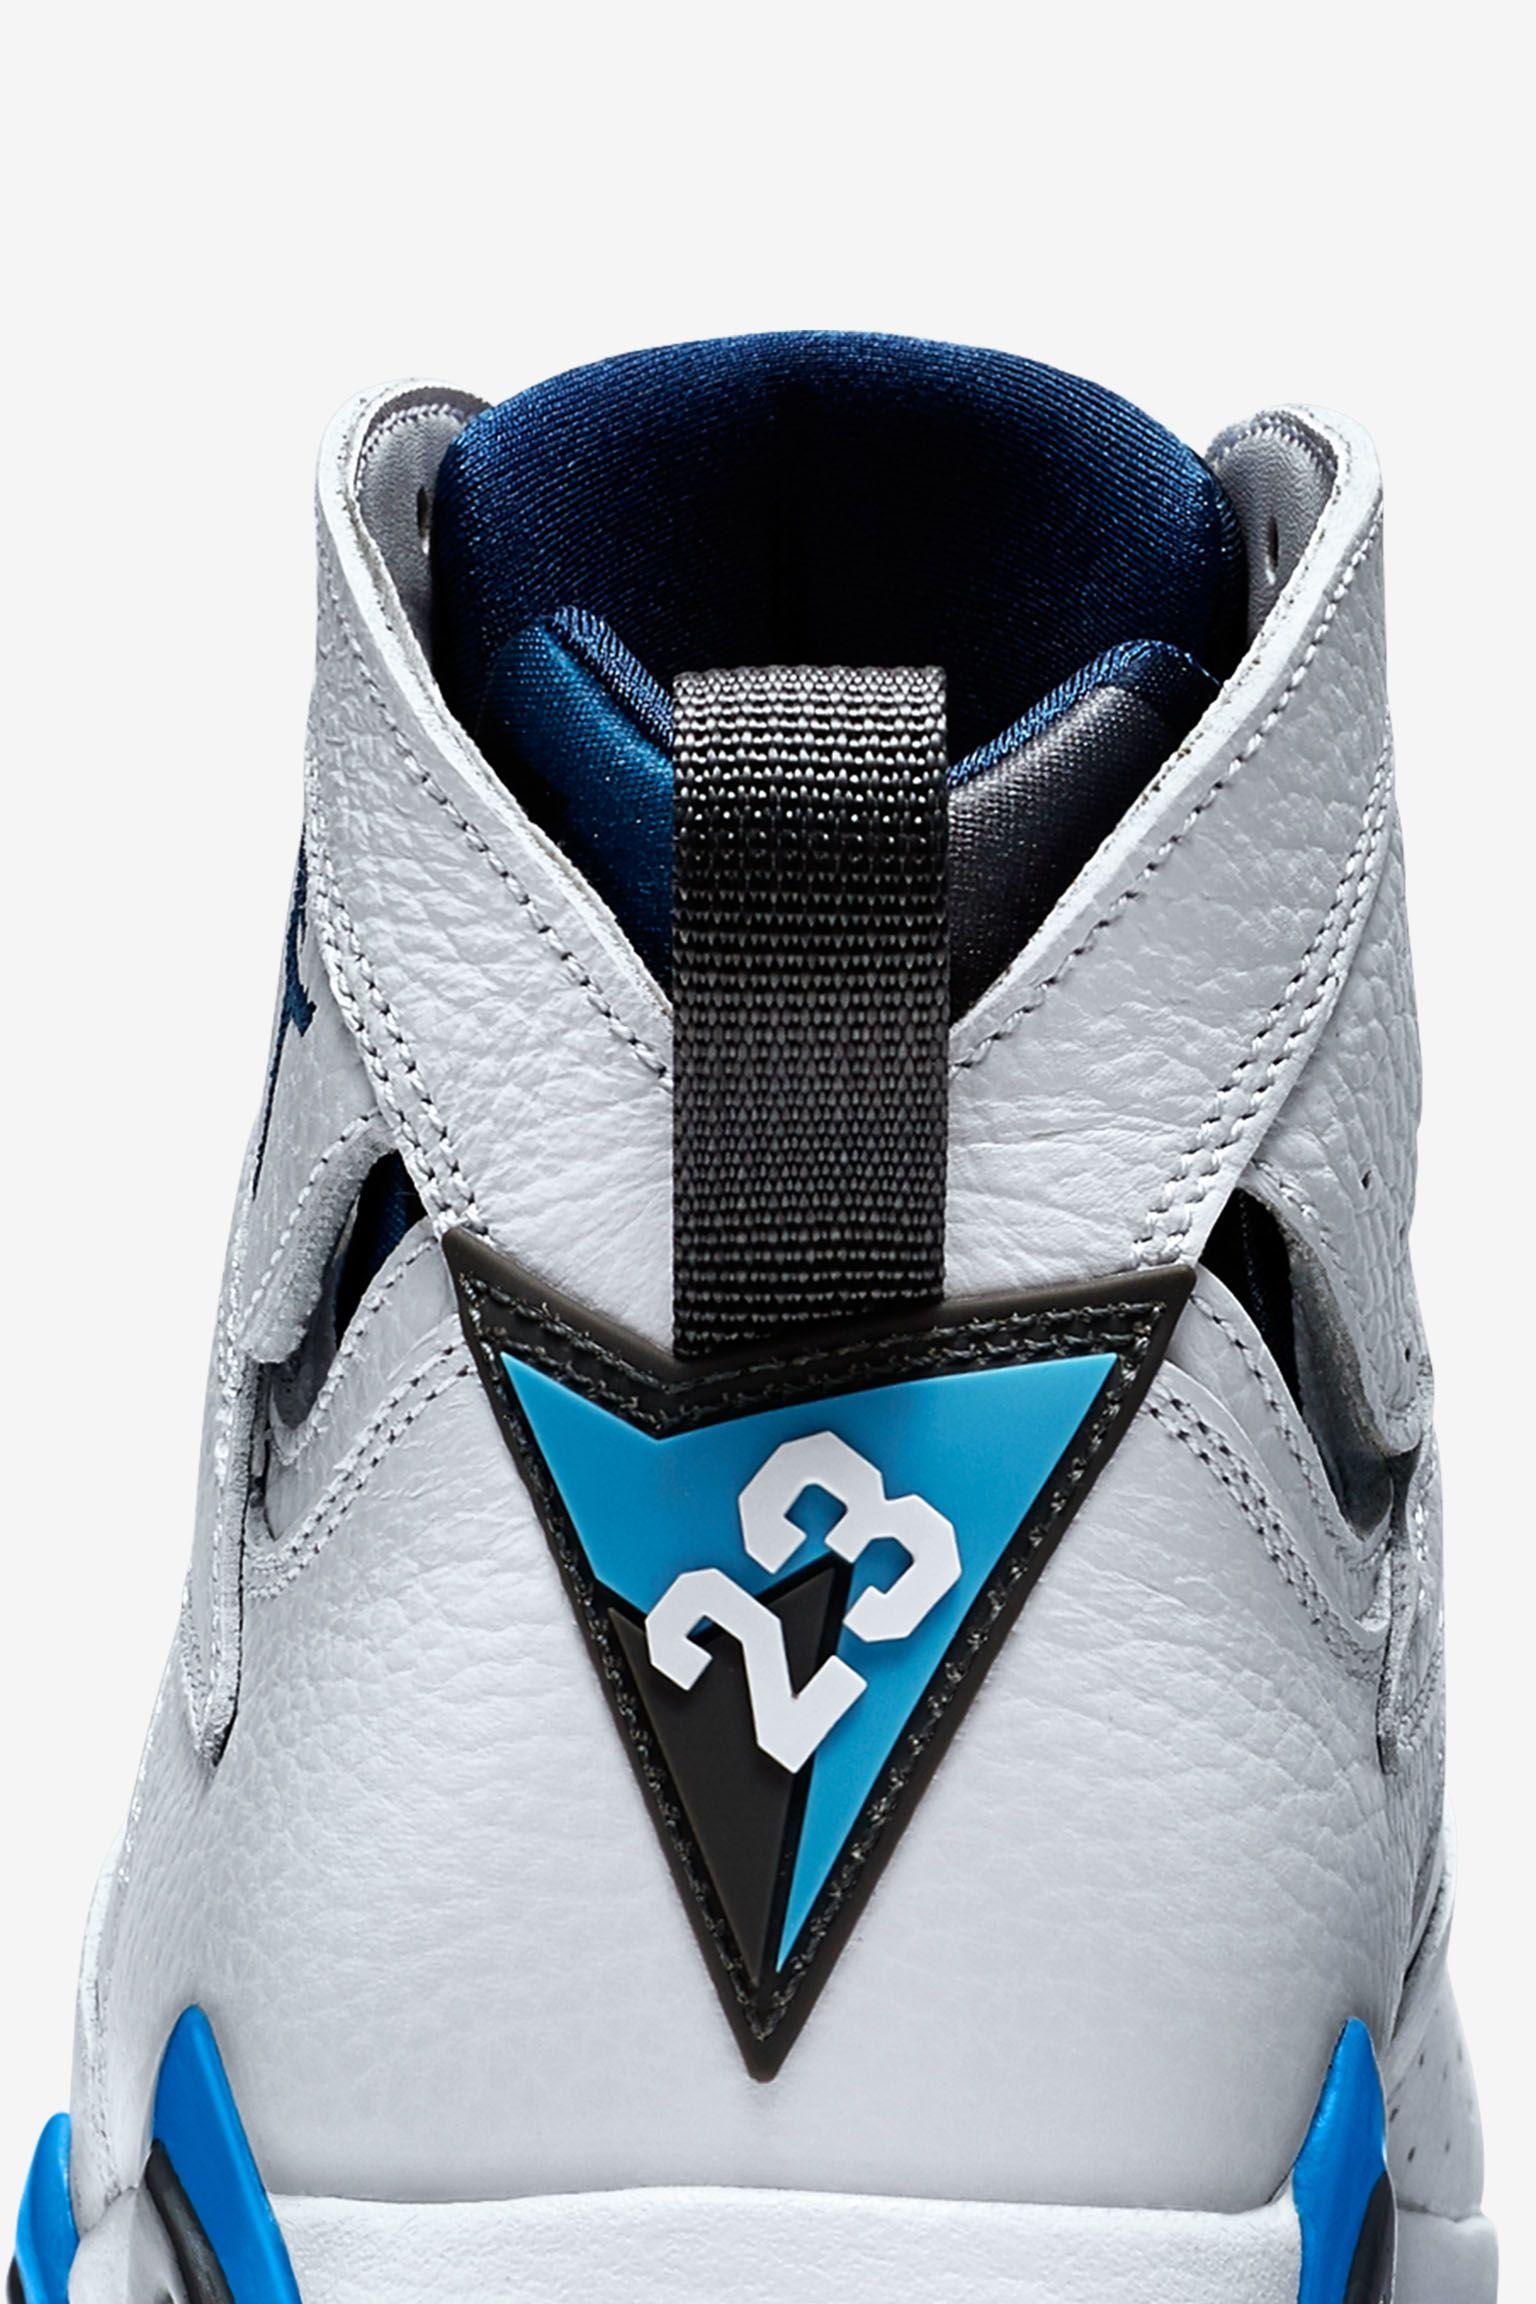 Air Jordan 7 Retro 'French Blue'